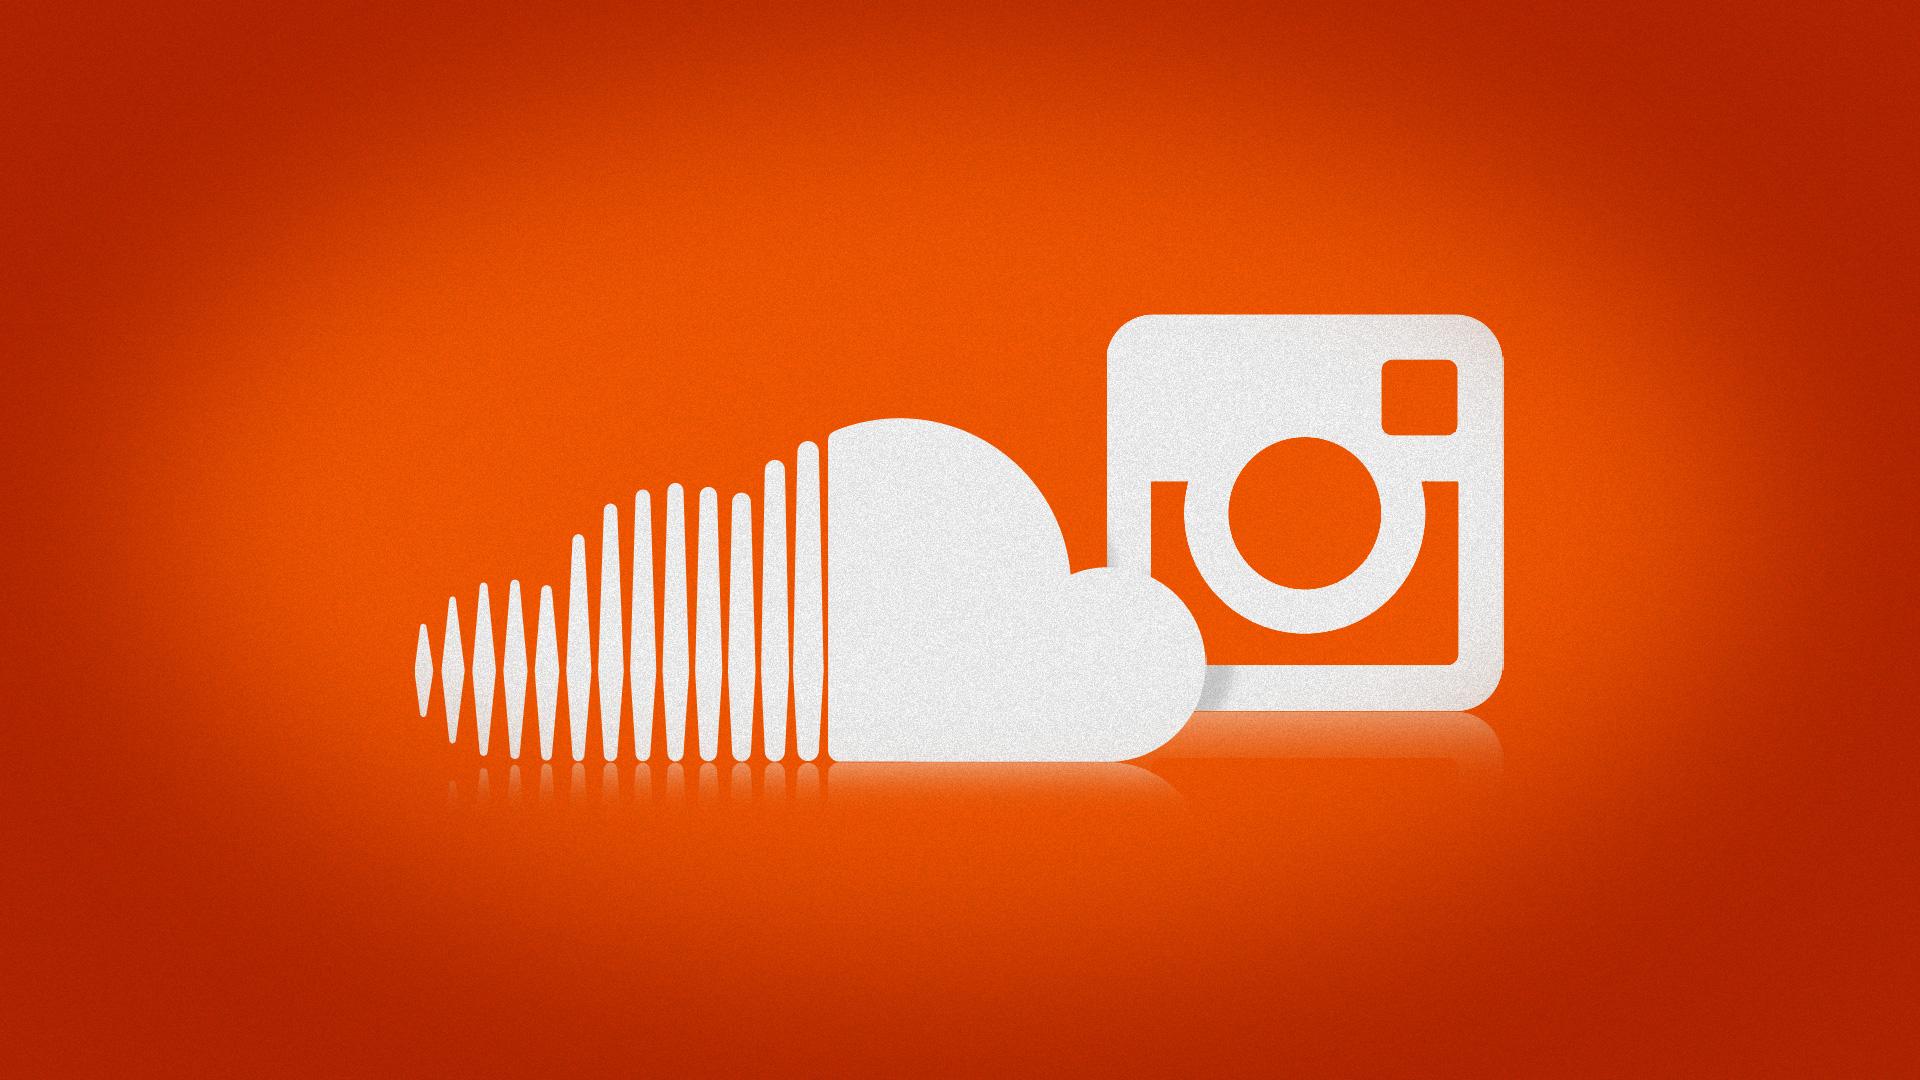 soundcloud er iphone 2015